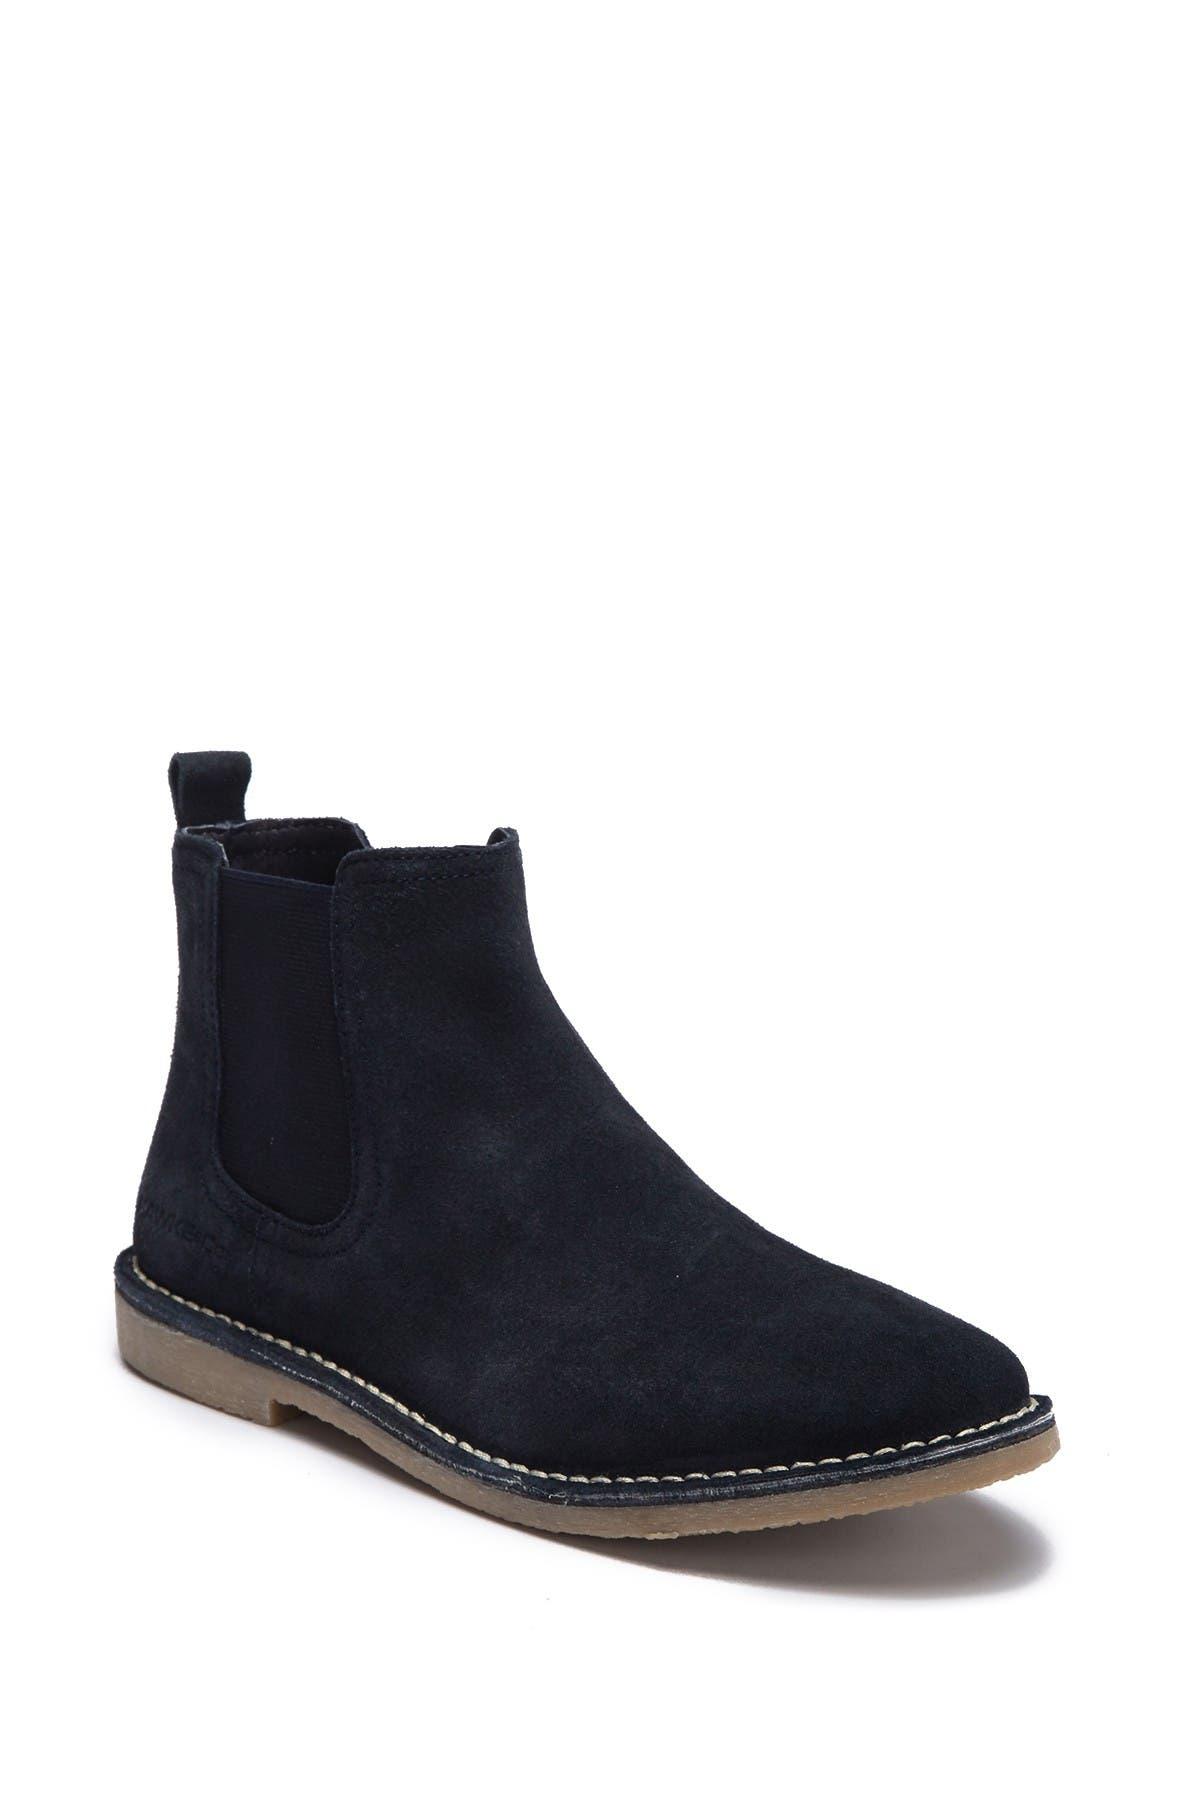 Image of Hawke & Co. Skylark Chelsea Boot